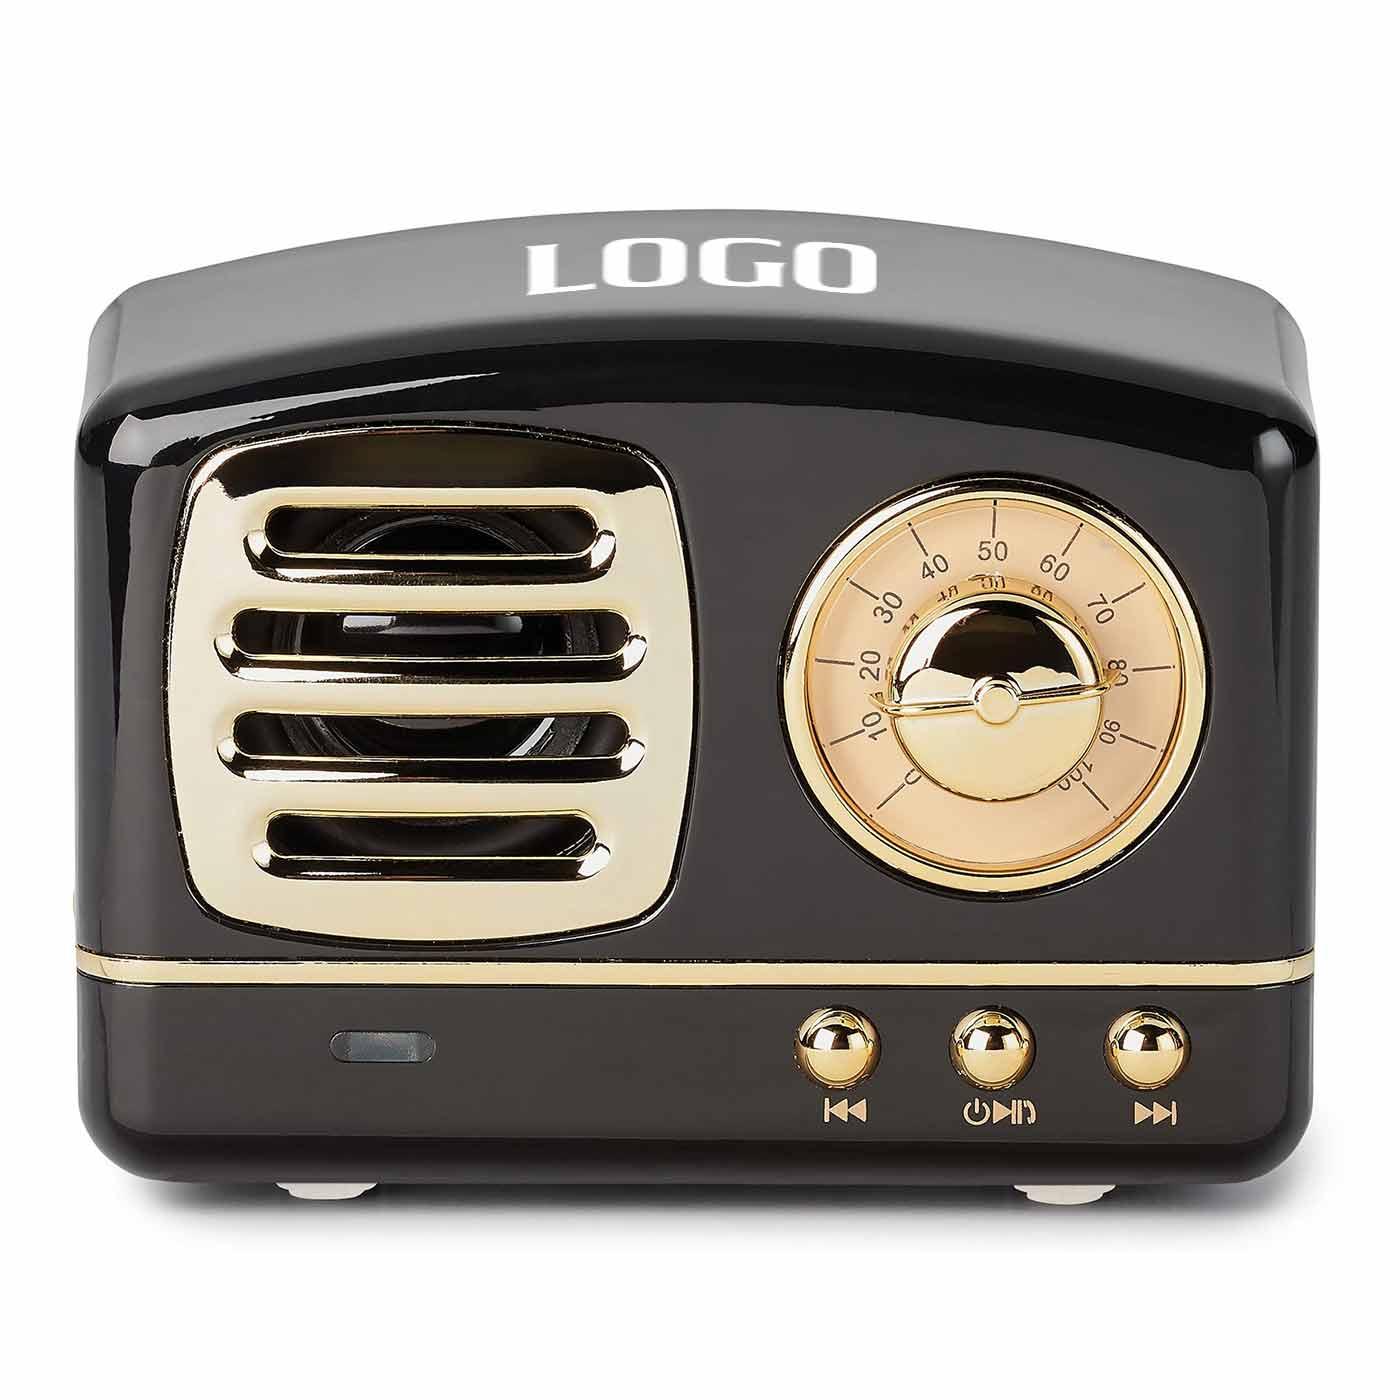 236104 trevor retro wireless speaker one color screenprint on top